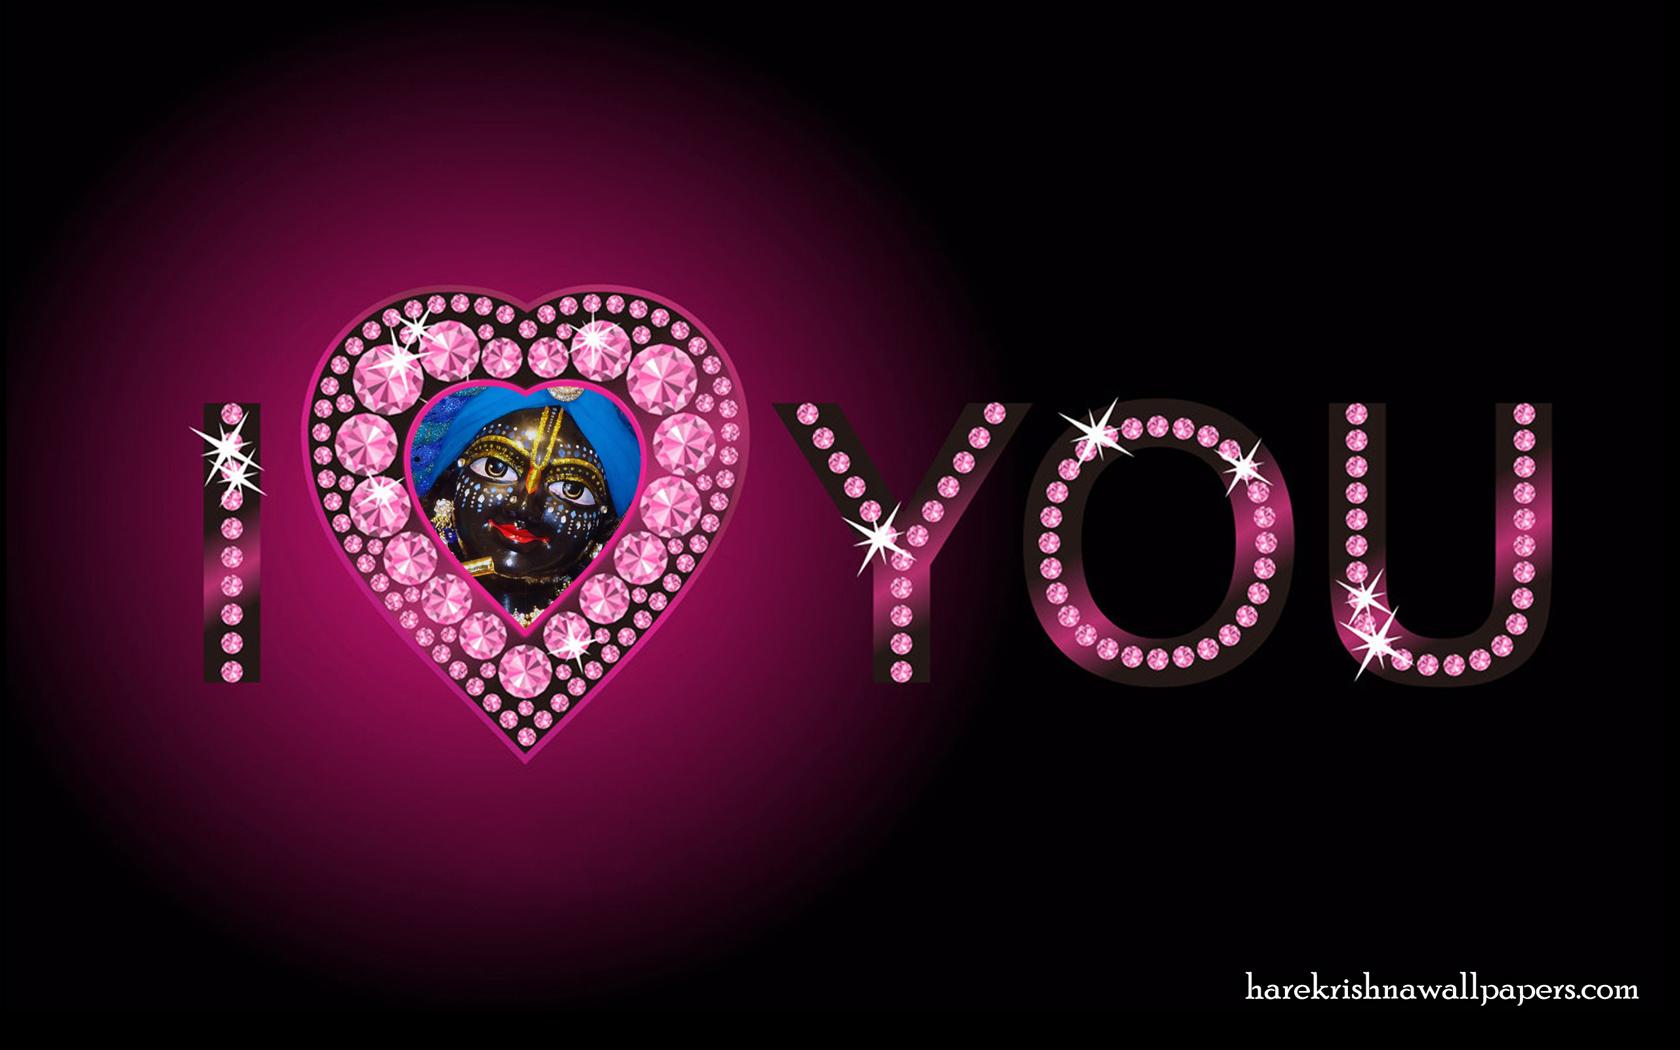 I Love You Gokulananda Wallpaper (006) Size 1680x1050 Download